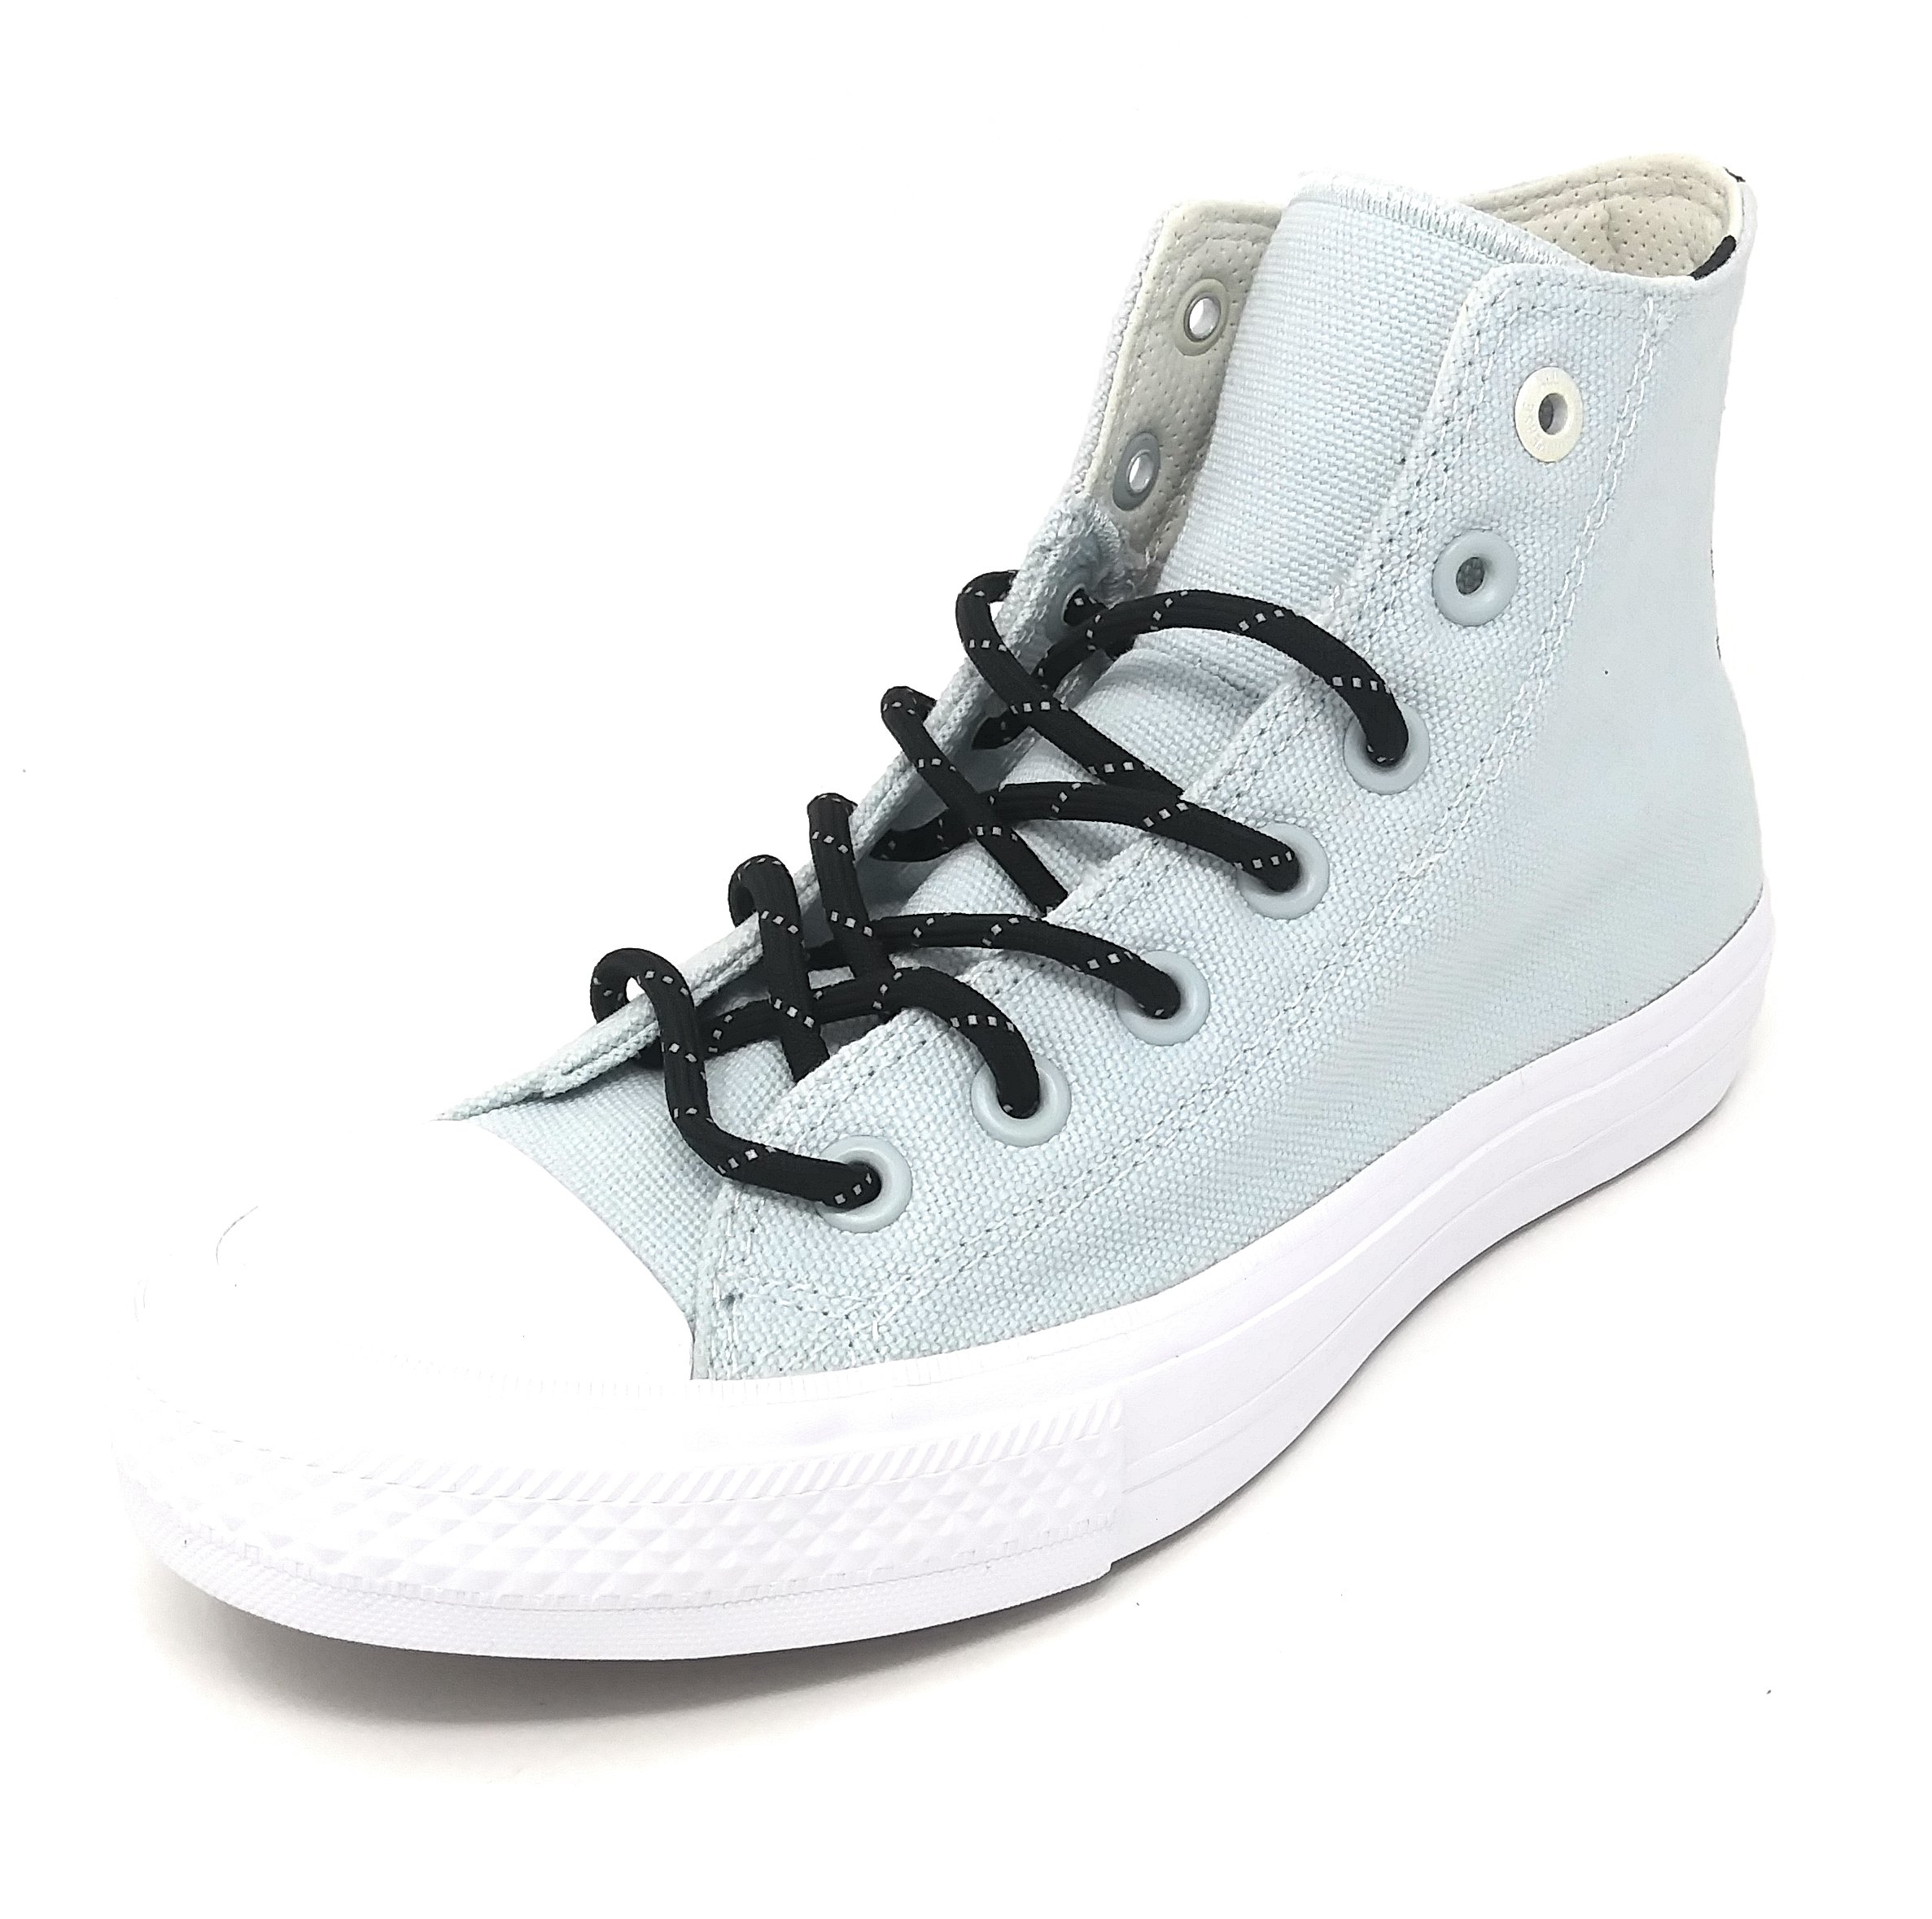 bb3482f7939 Galleon - Converse Chuck Taylor II All Star Hi Top Sneaker Shield Canvas  Polar (6.5 B(M) US Women 4.5 D(M) US Men)